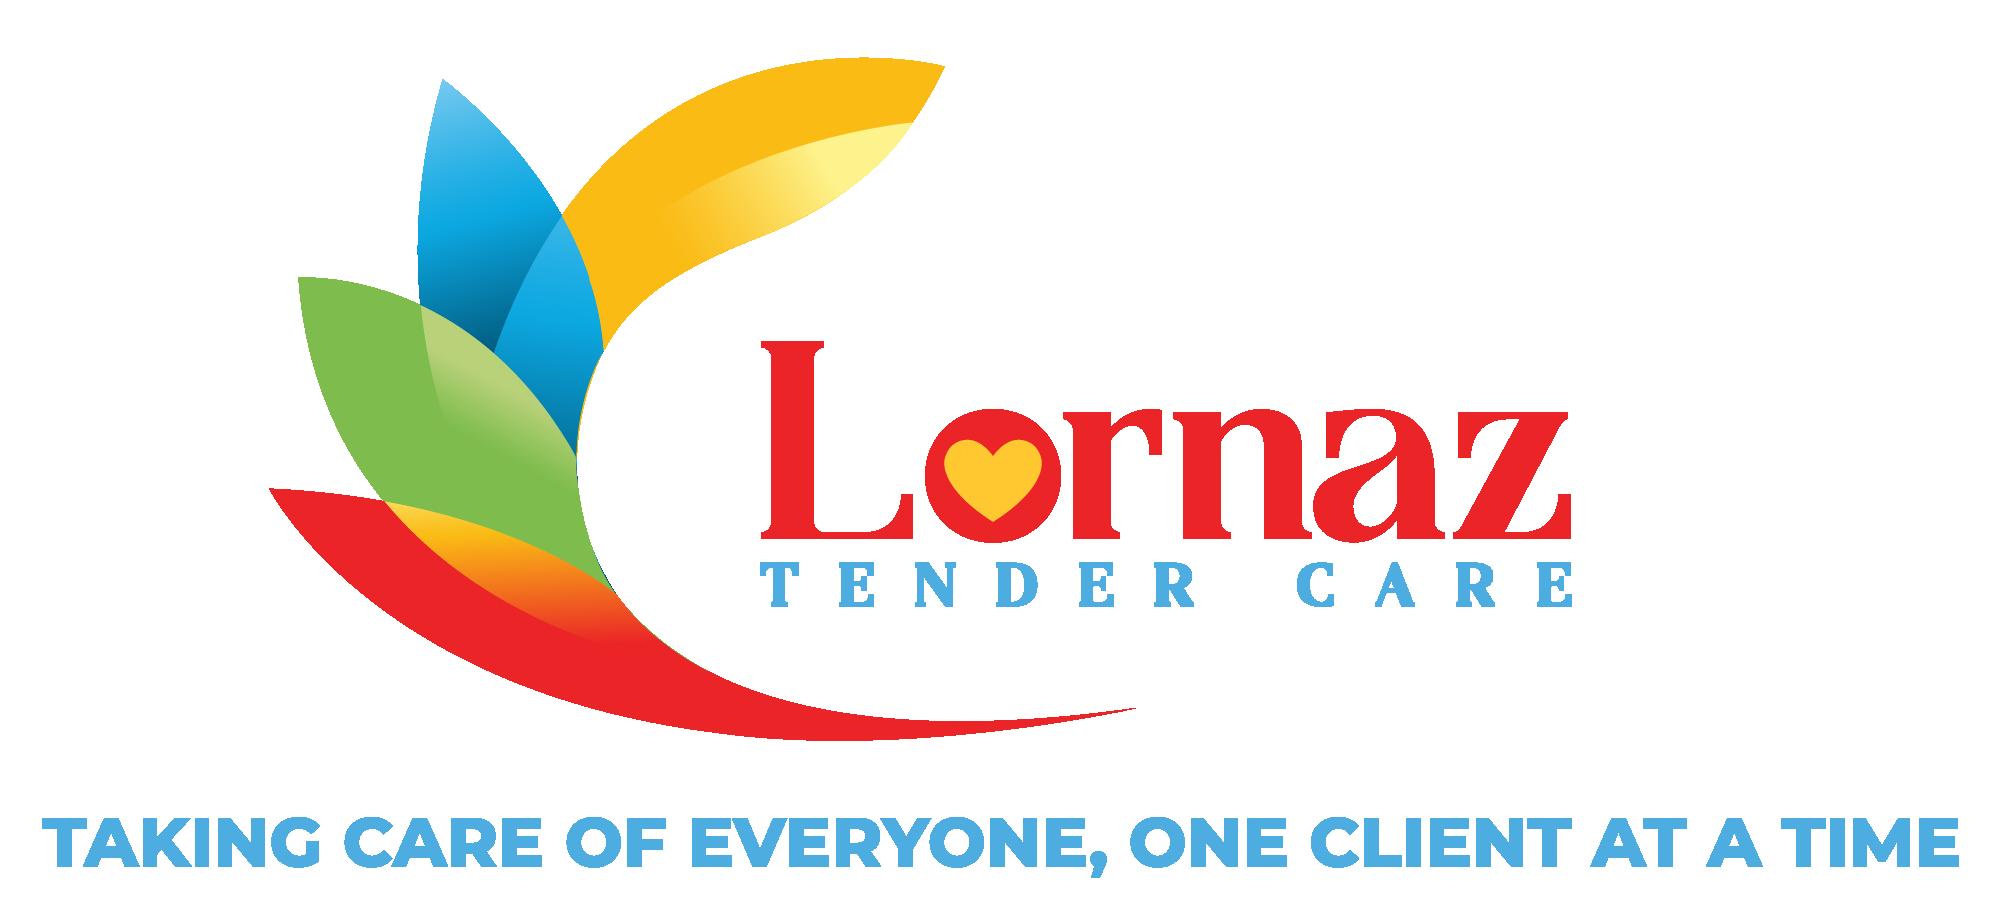 CX-12307_Lornaz-Tender-Care_FINAL_REVISED2